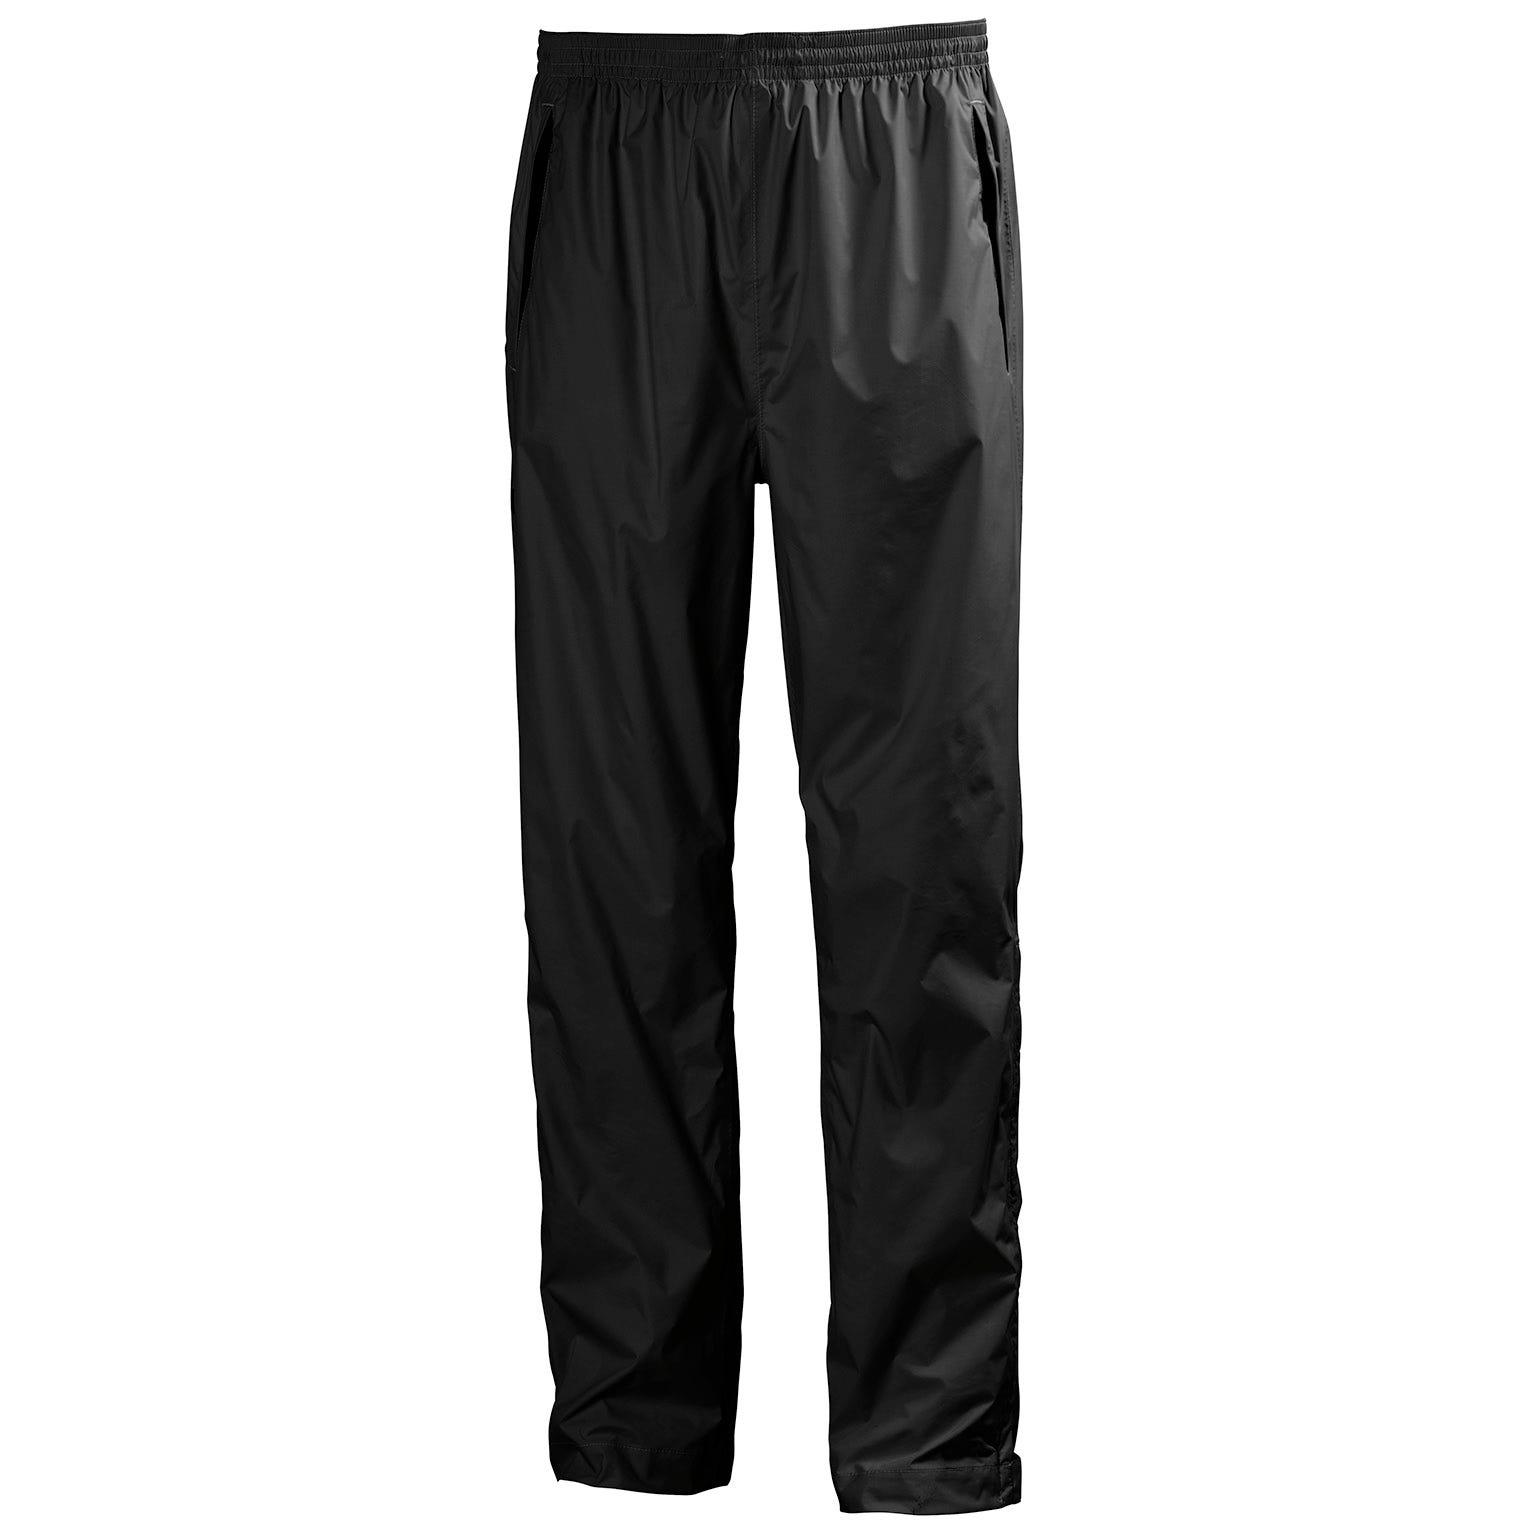 Helly Hansen Loke Pants Mens Hiking Pant Black S